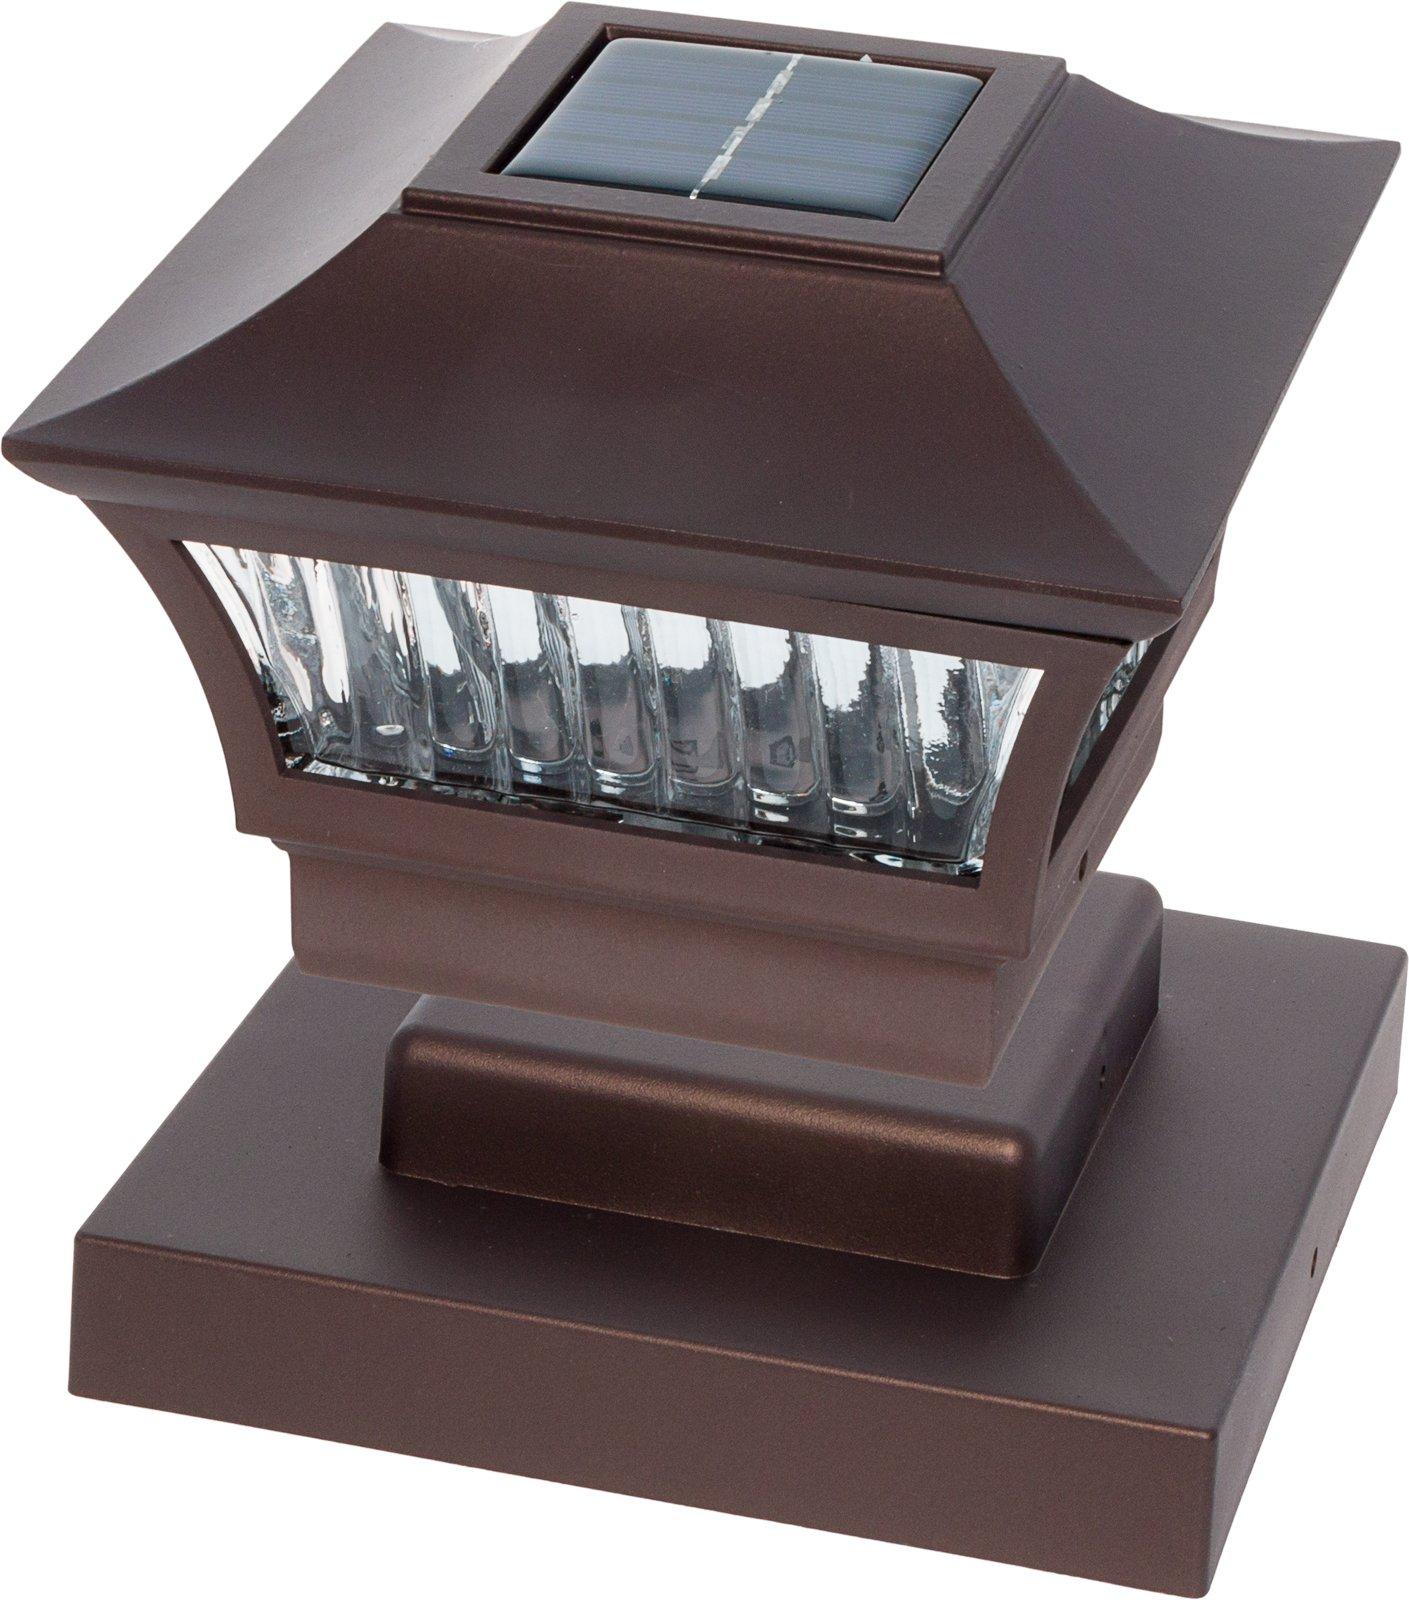 GreenLighting Bronze Aluminum Solar Post Cap Light 4x4 Wood & 6x6 PVC (2 Pack) by GreenLighting (Image #7)